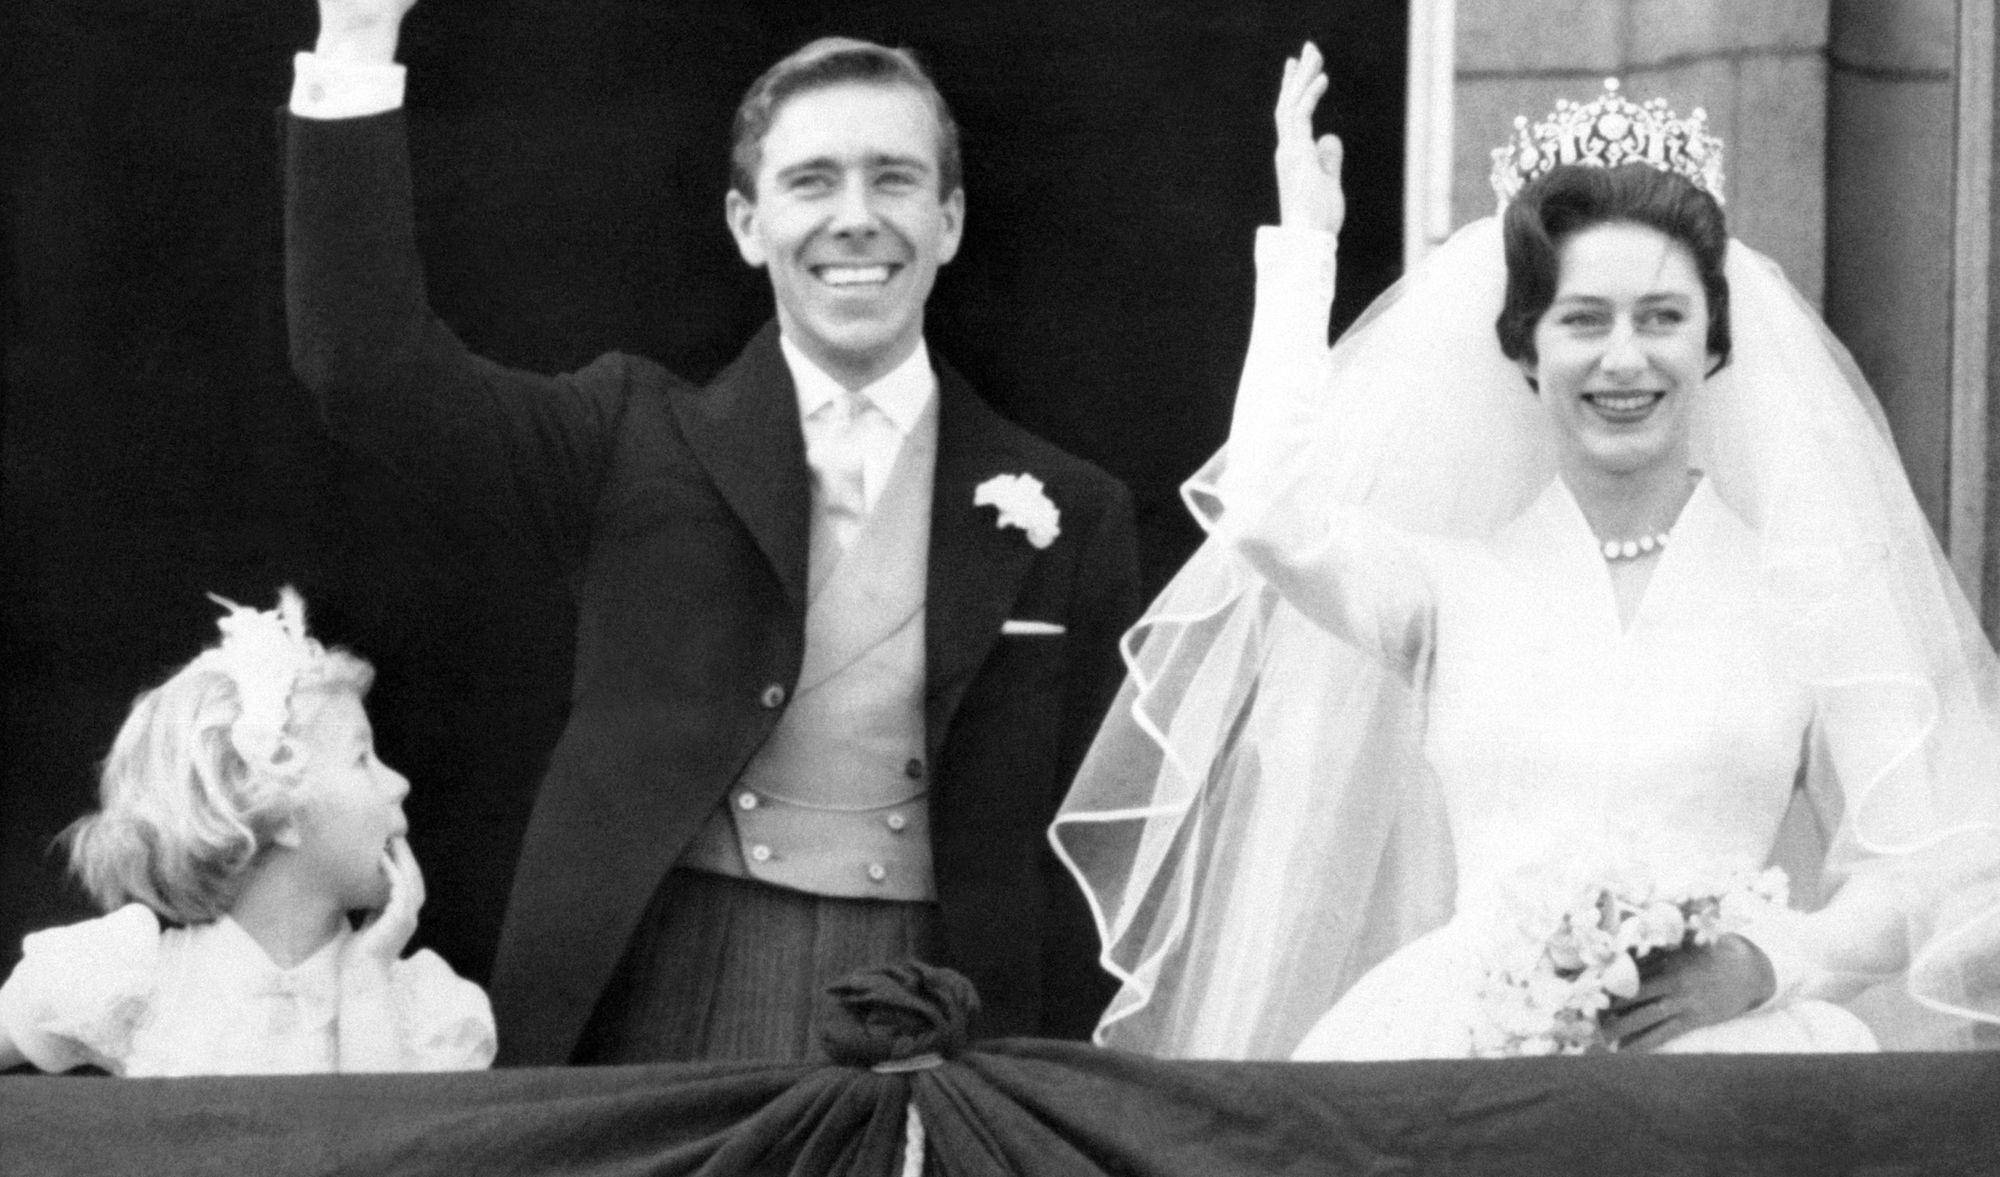 Pin by Barbara B on Royalty Princess margaret wedding